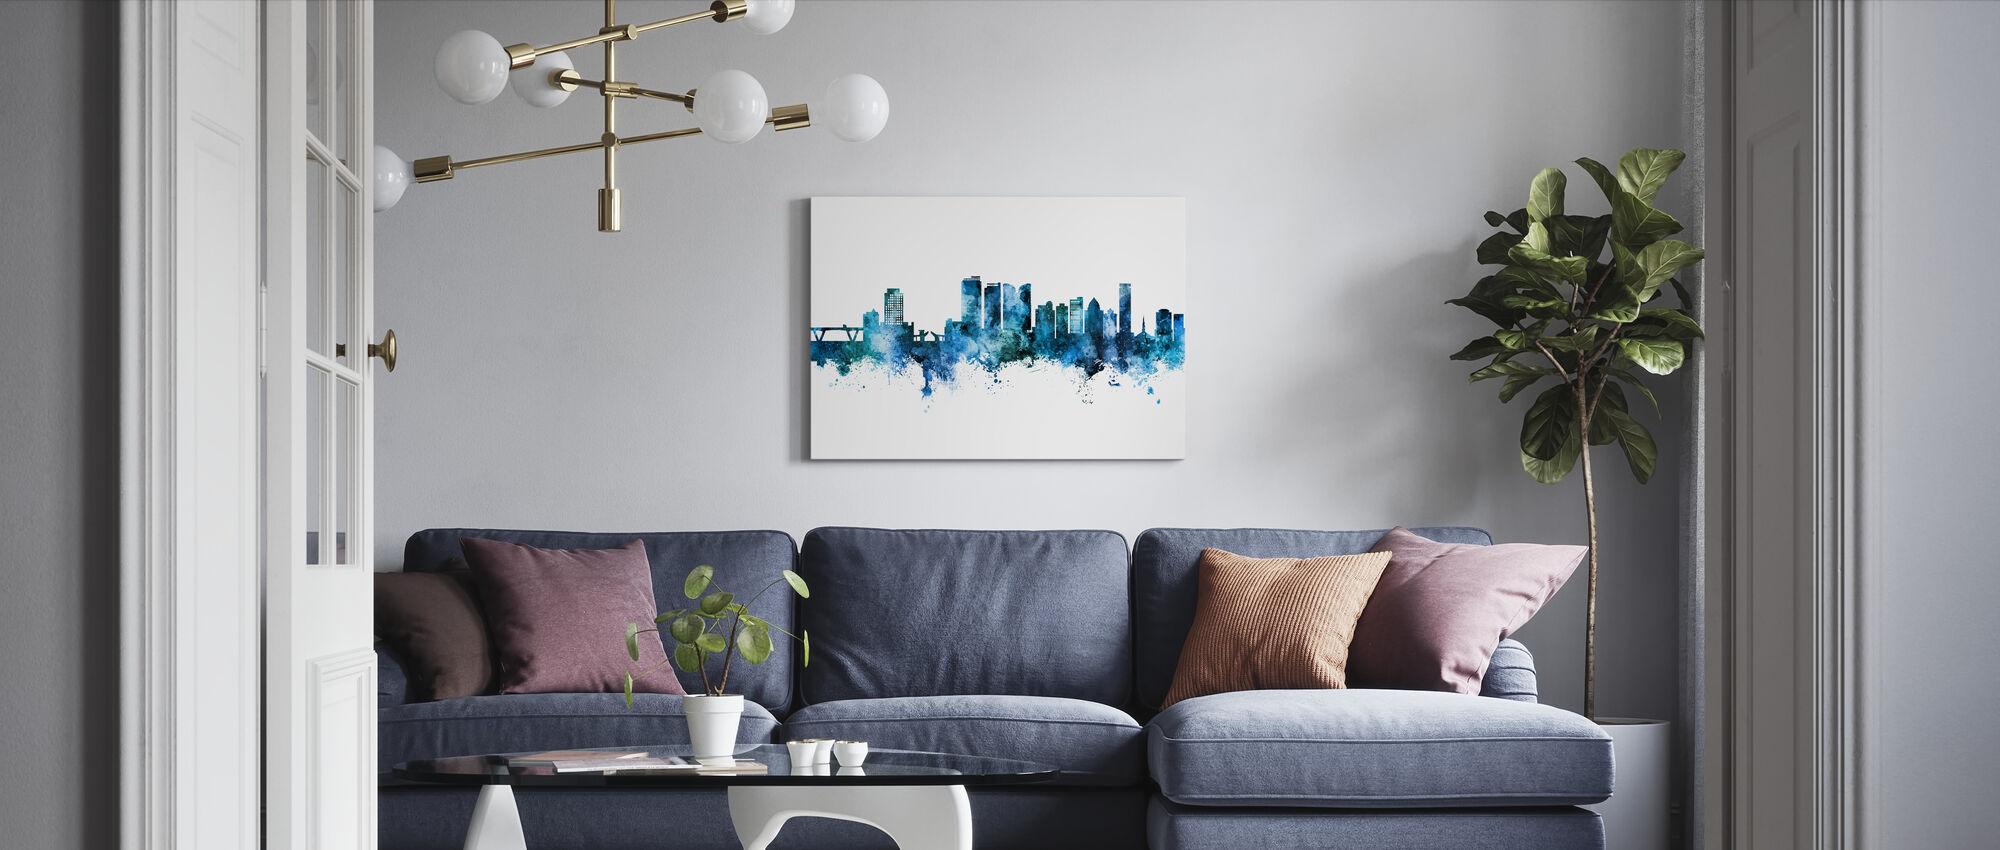 Fort Lauderdale Florida Skyline - Canvas print - Living Room